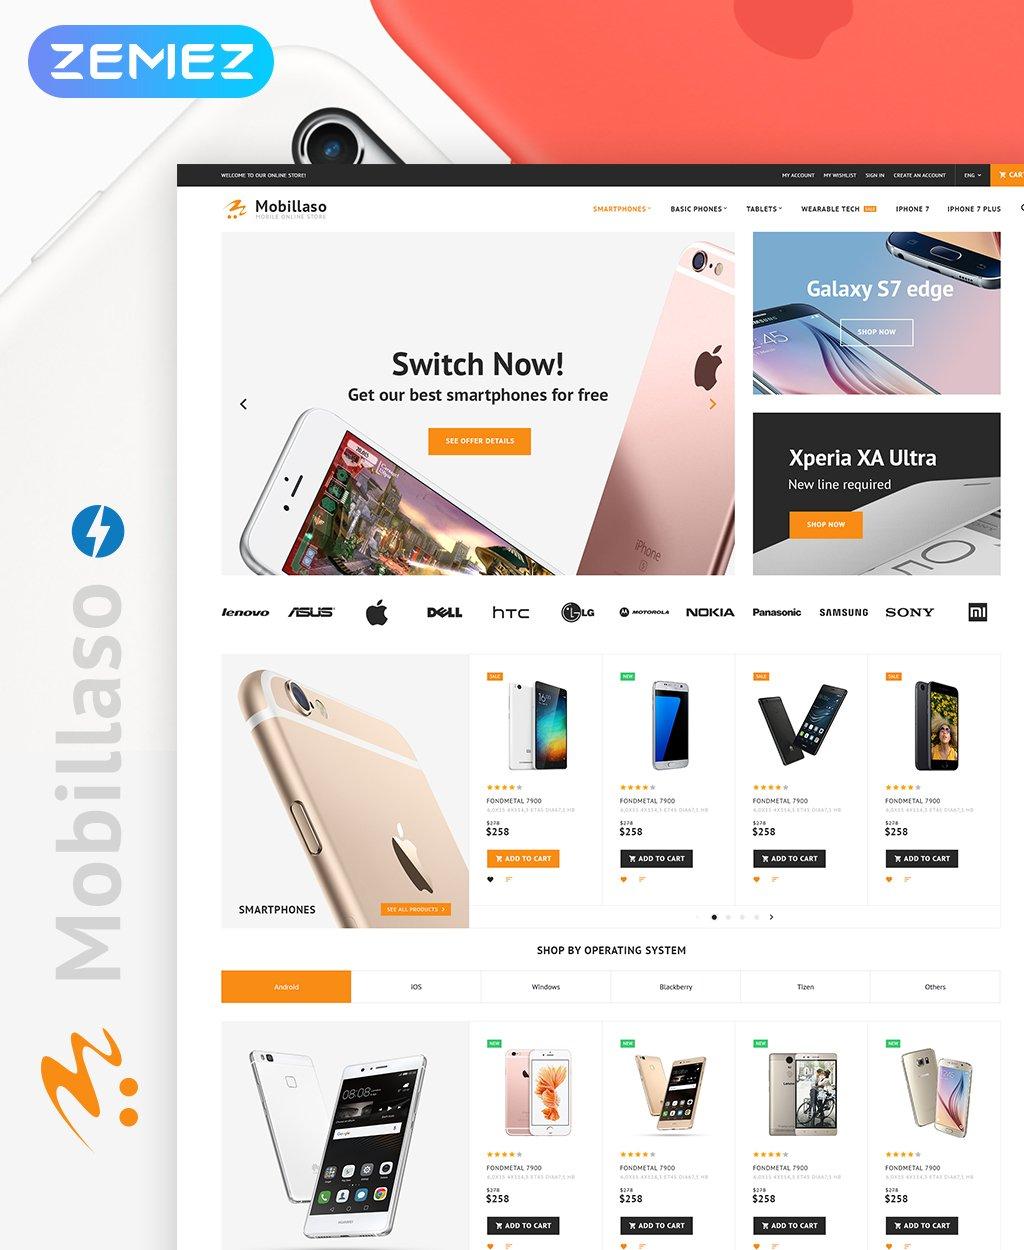 Responsywny szablon Magento Mobillaso - Mobile Store Responsive #62283 - zrzut ekranu